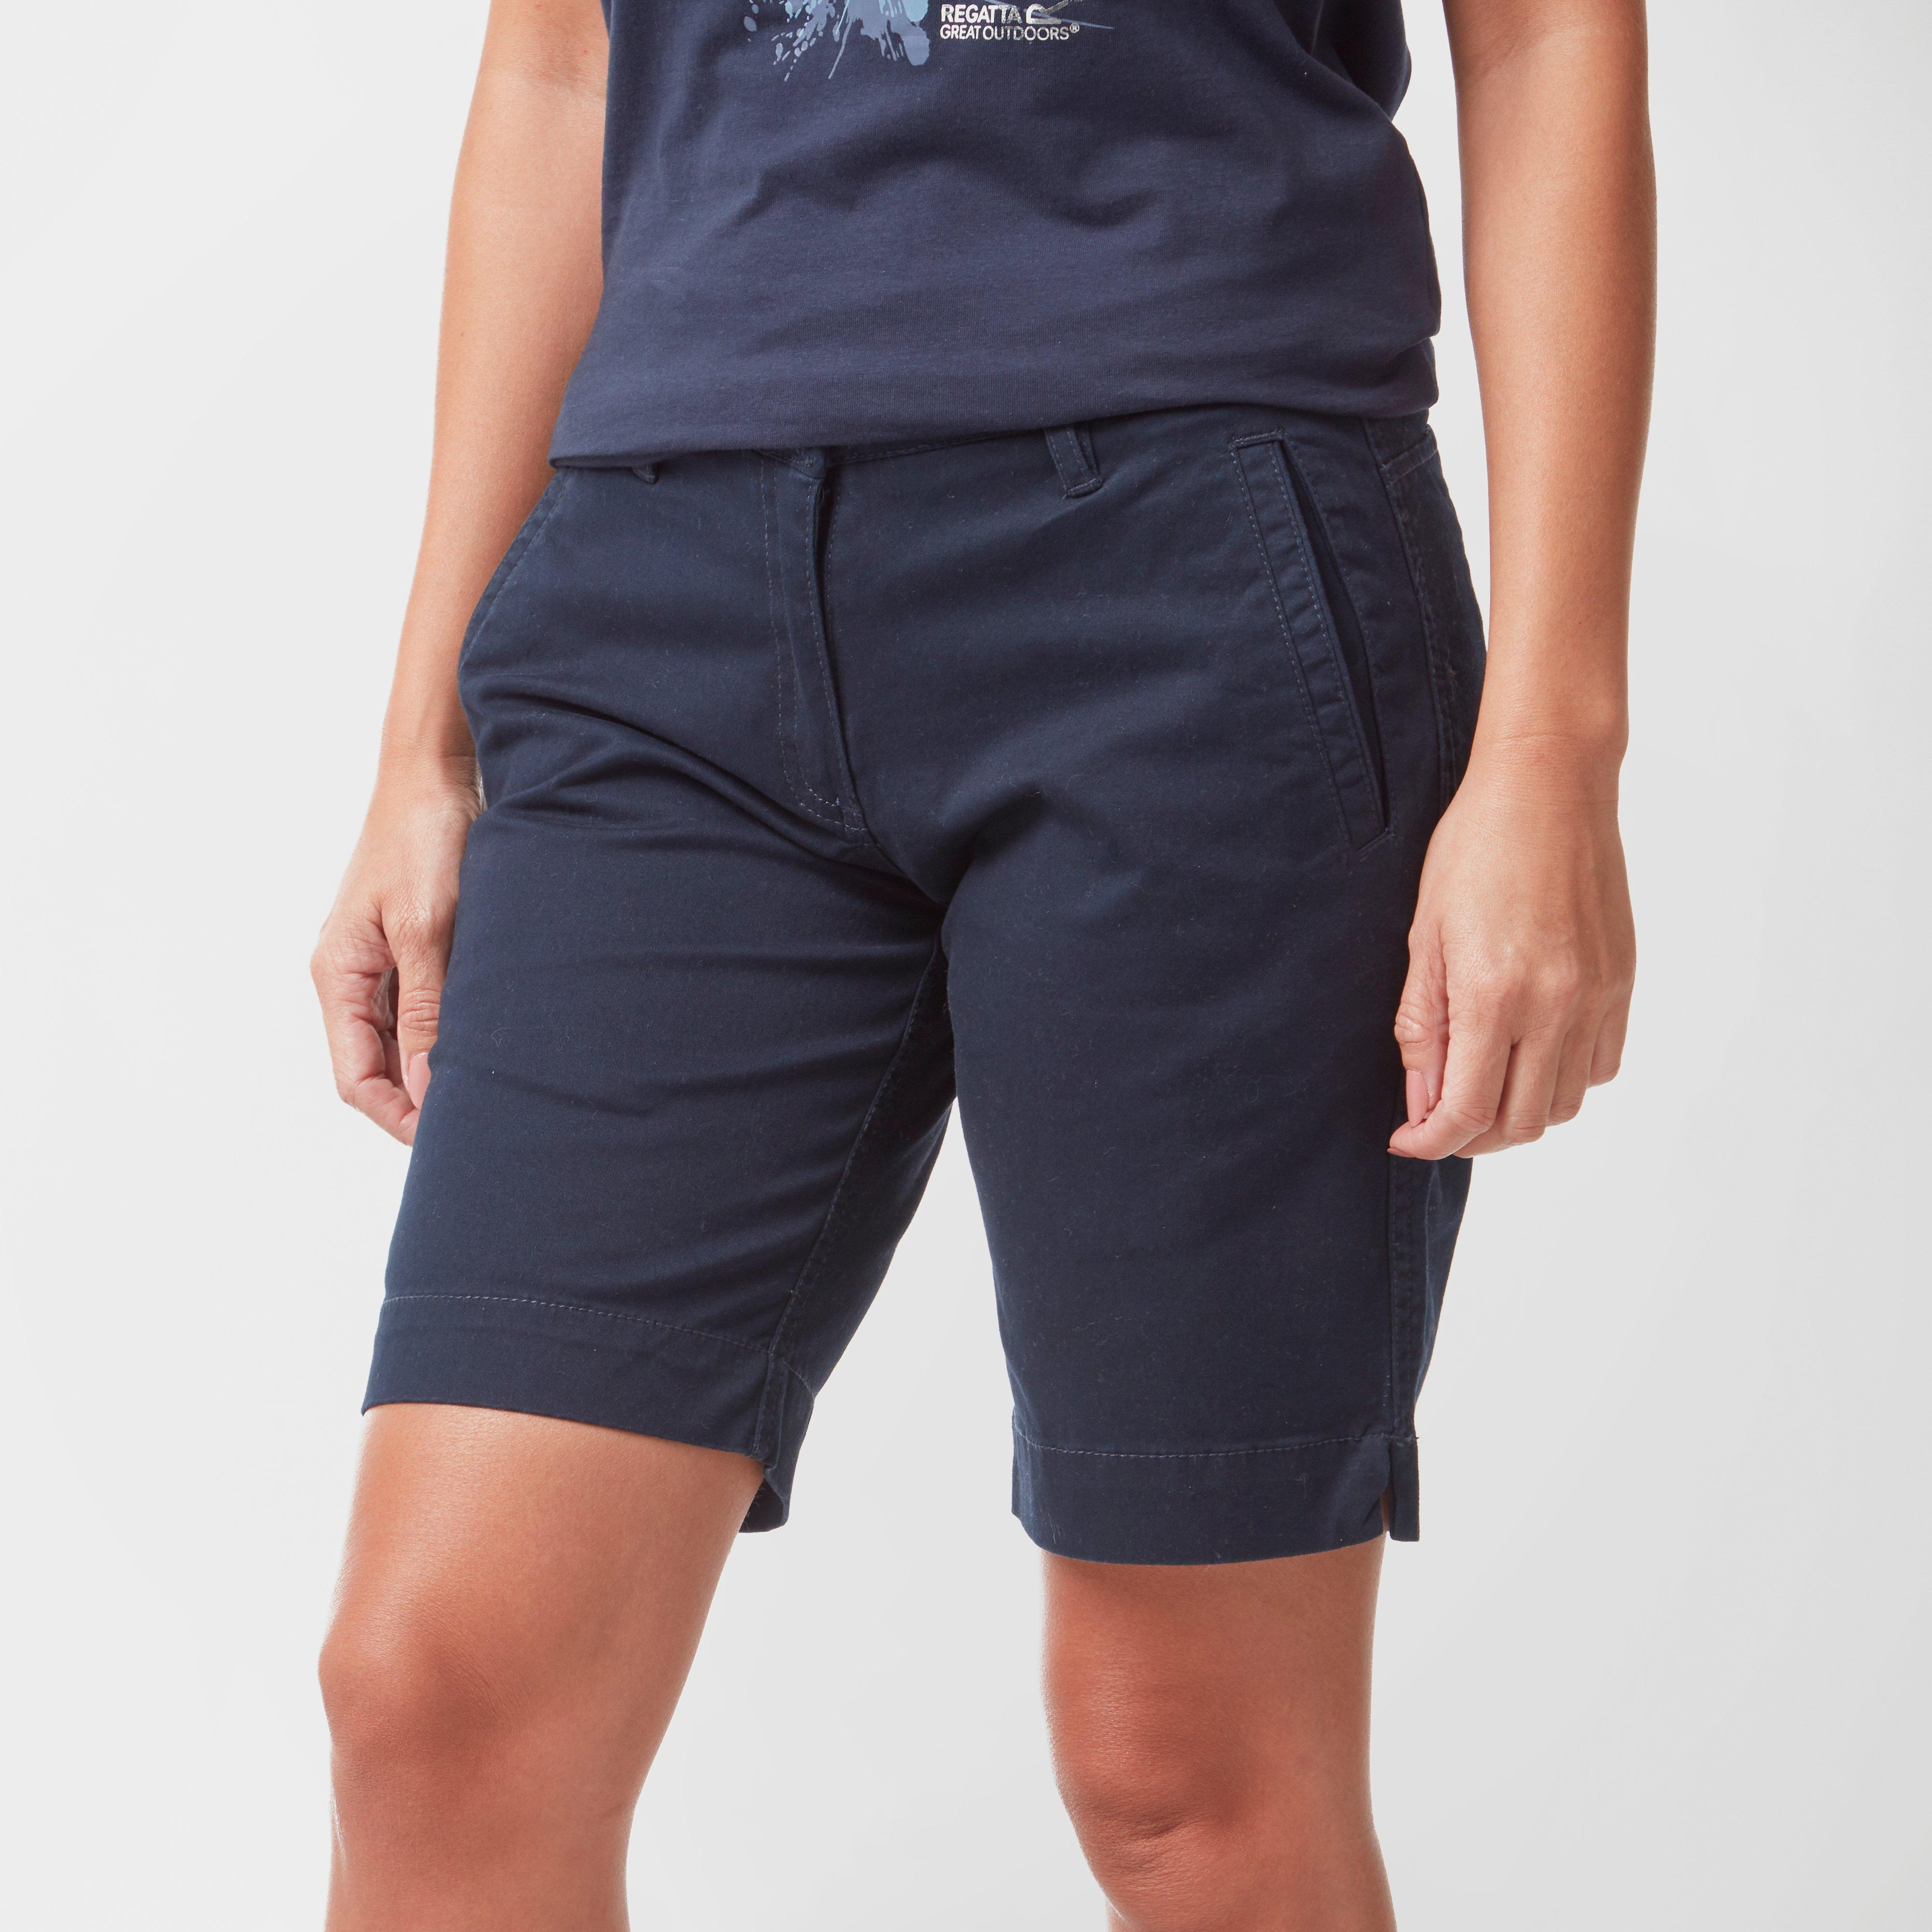 Regatta Regatta Womens Solita Stretch Shorts - Navy, Navy